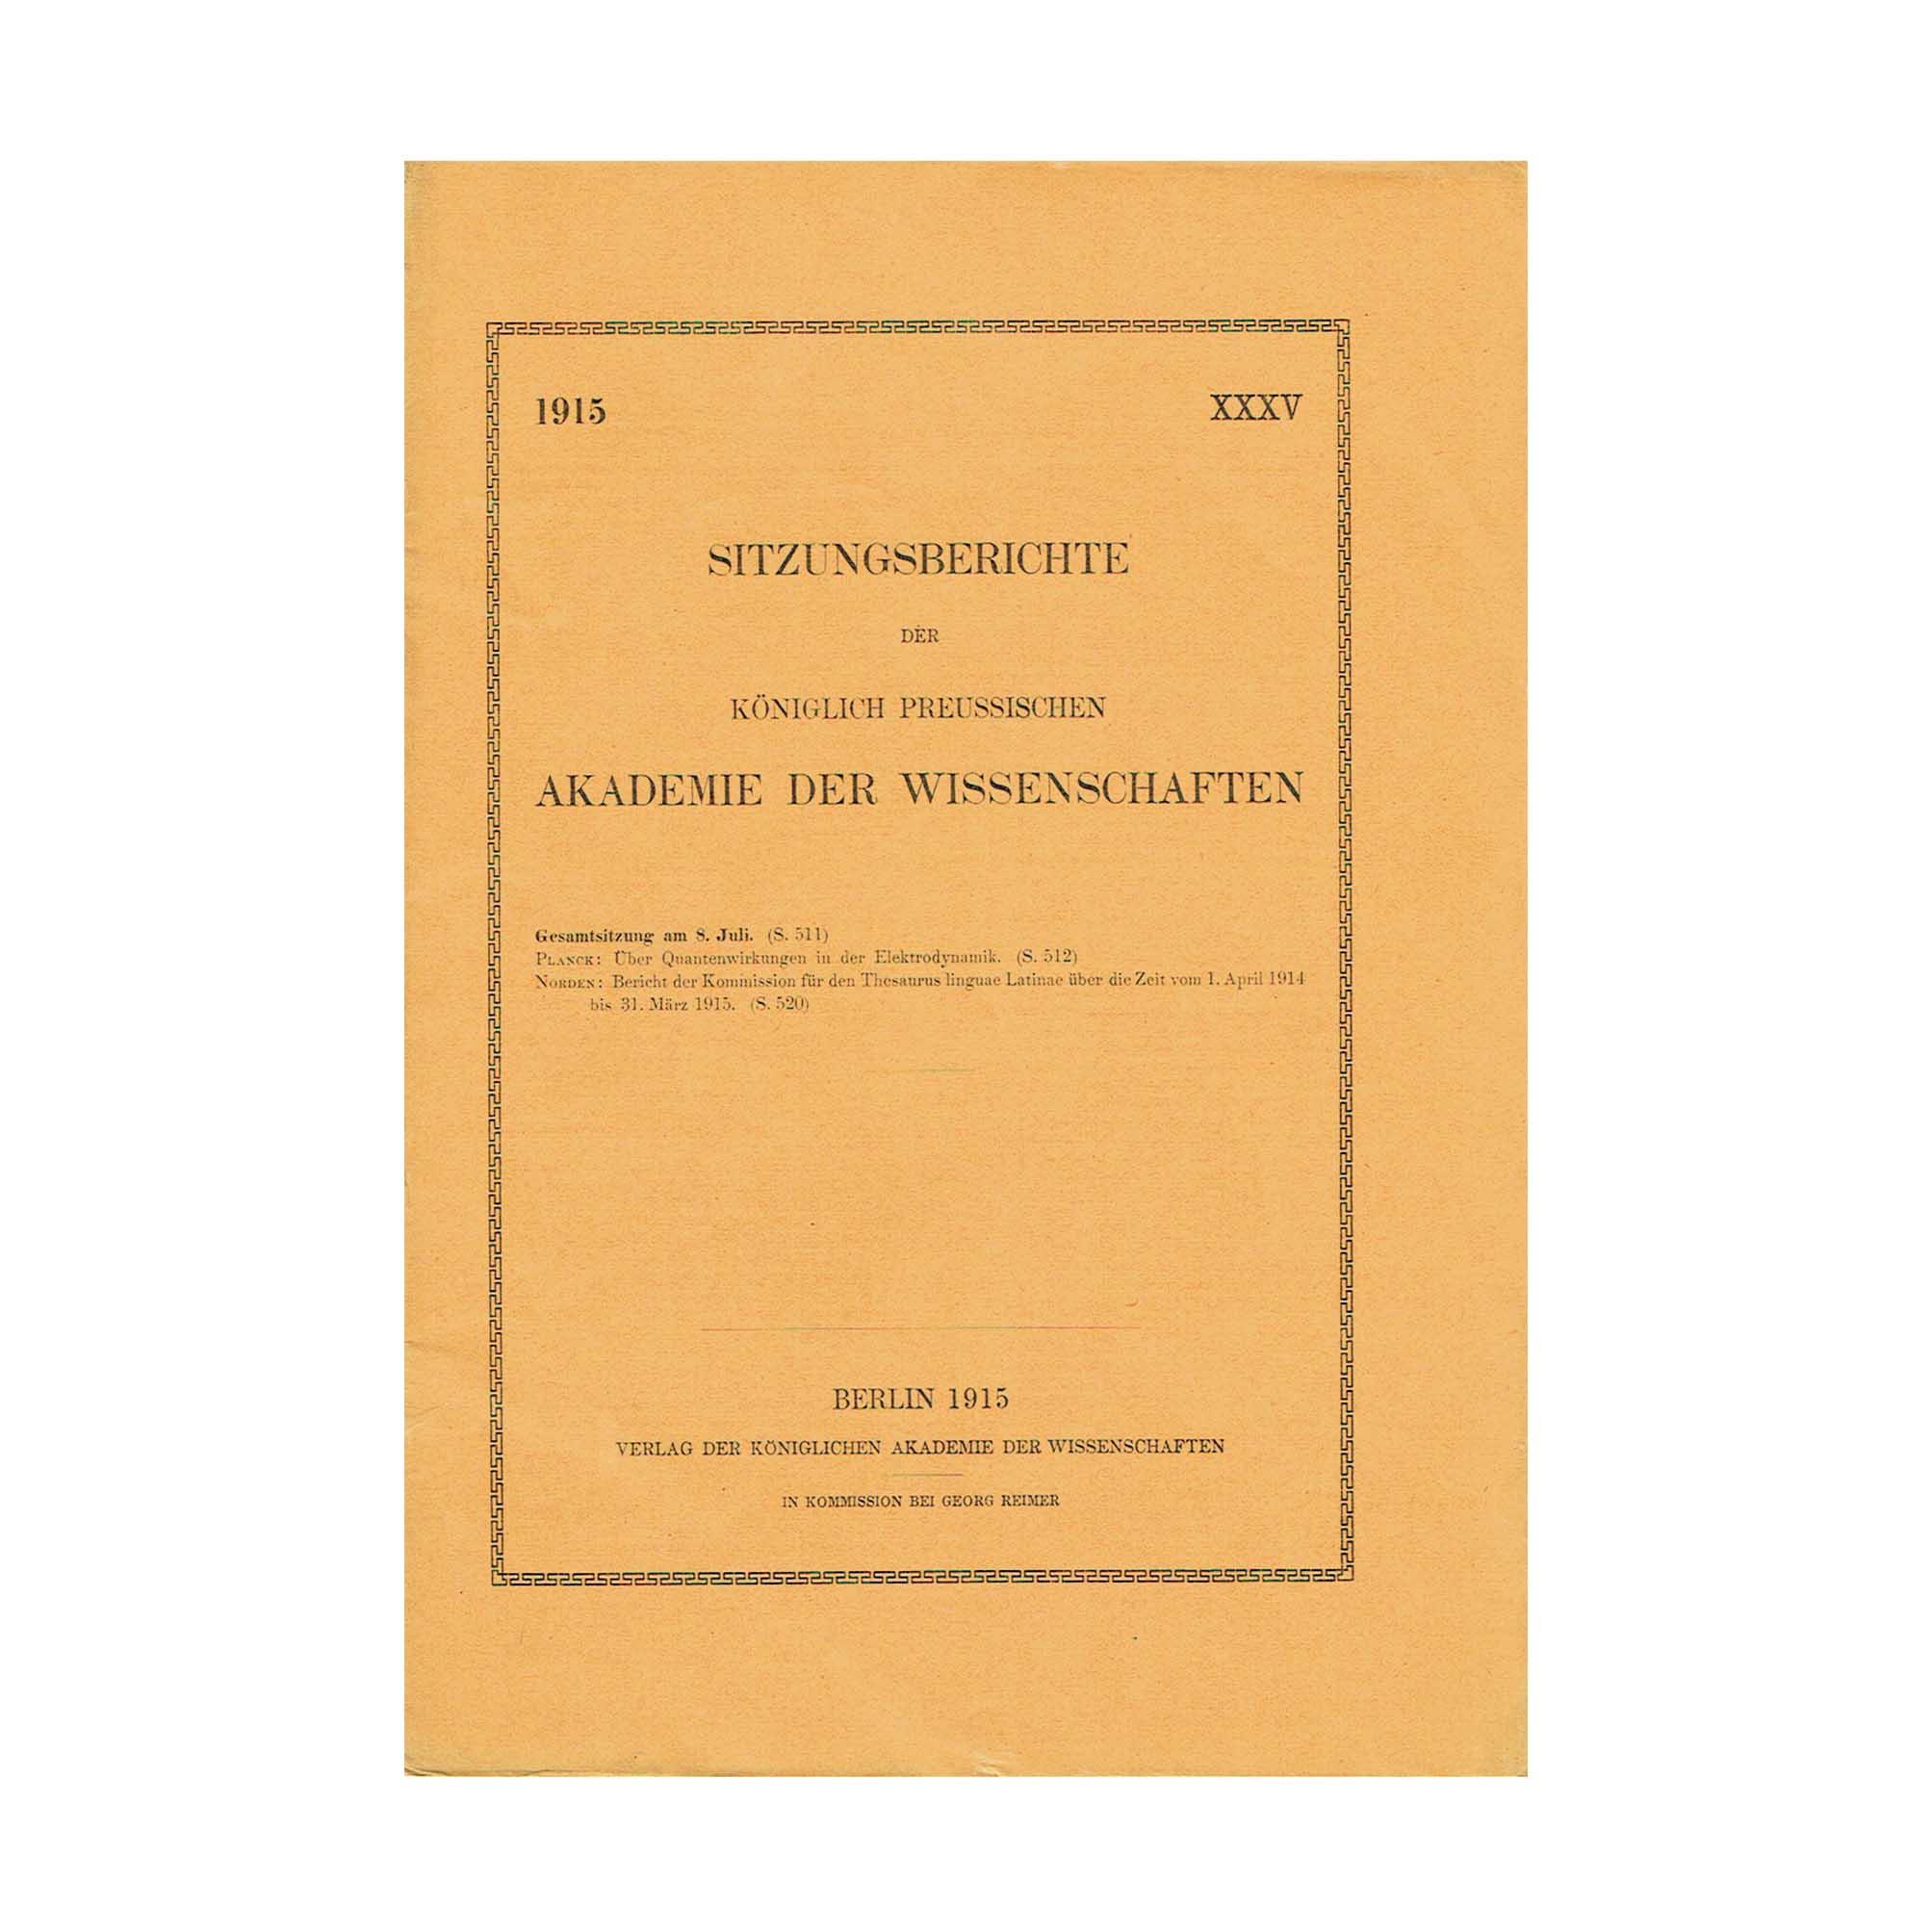 5820K-Planck-Quantenwirkung-Elektrodynamik-First-Separate-1915-Front-Cover-N.jpeg